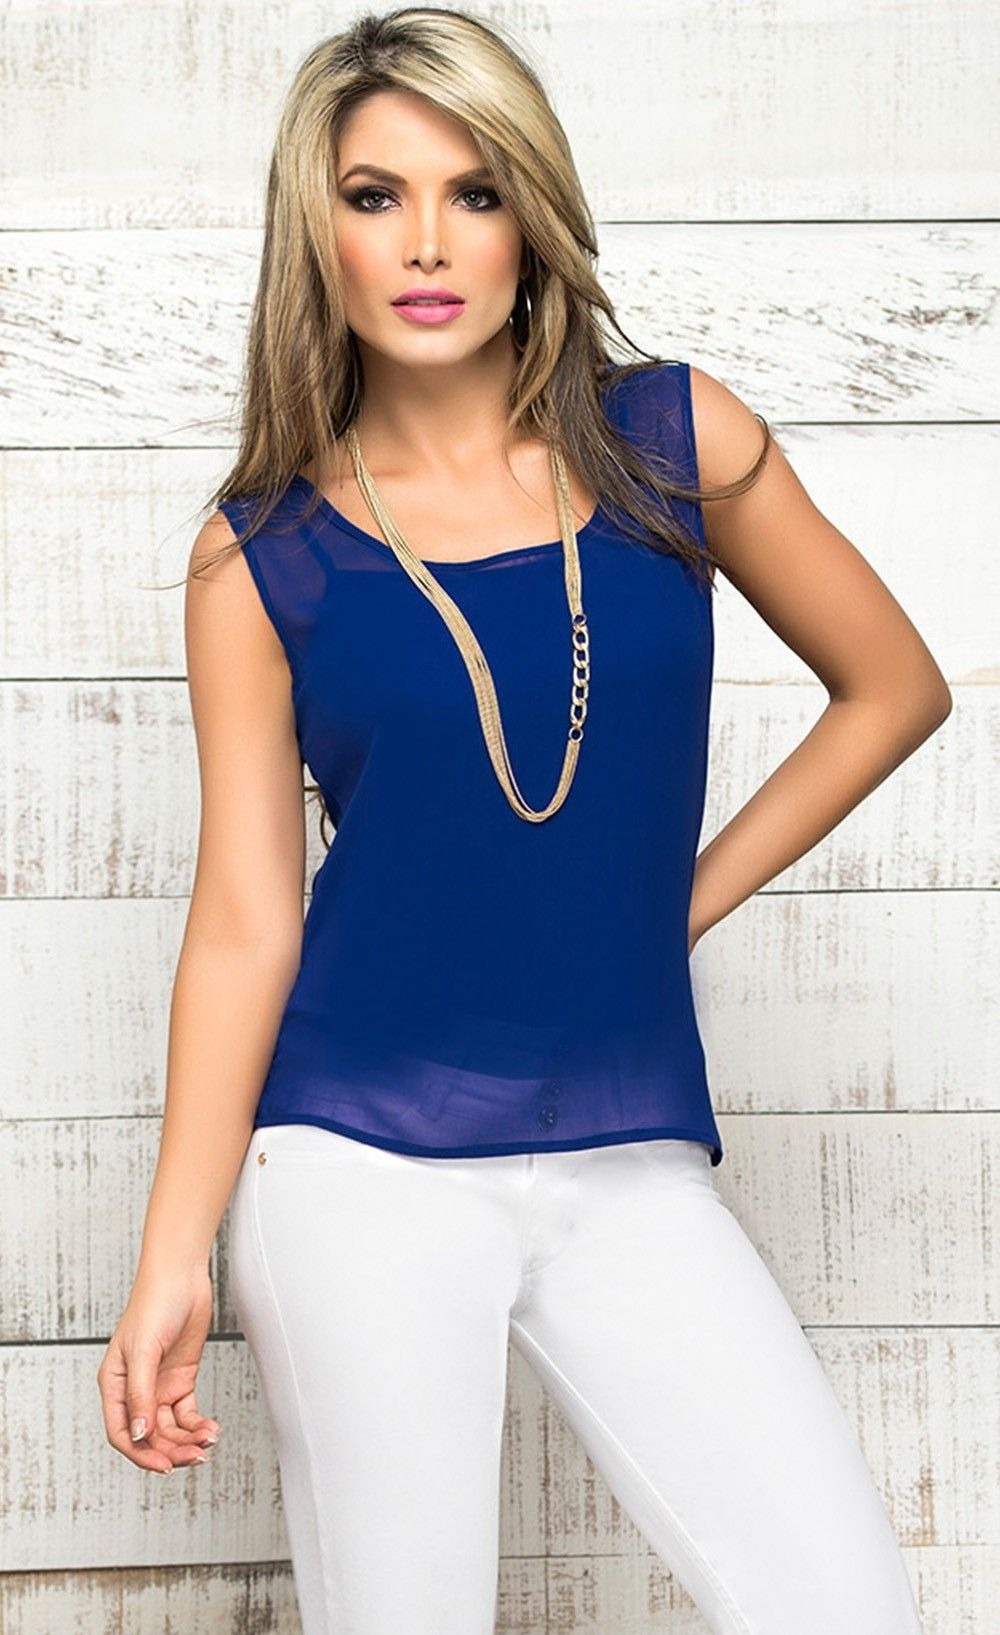 Outfit Pantalon Blanco Blusa Azul - Buscar Con Google | Blue Fashion | Pinterest | Clothing ...